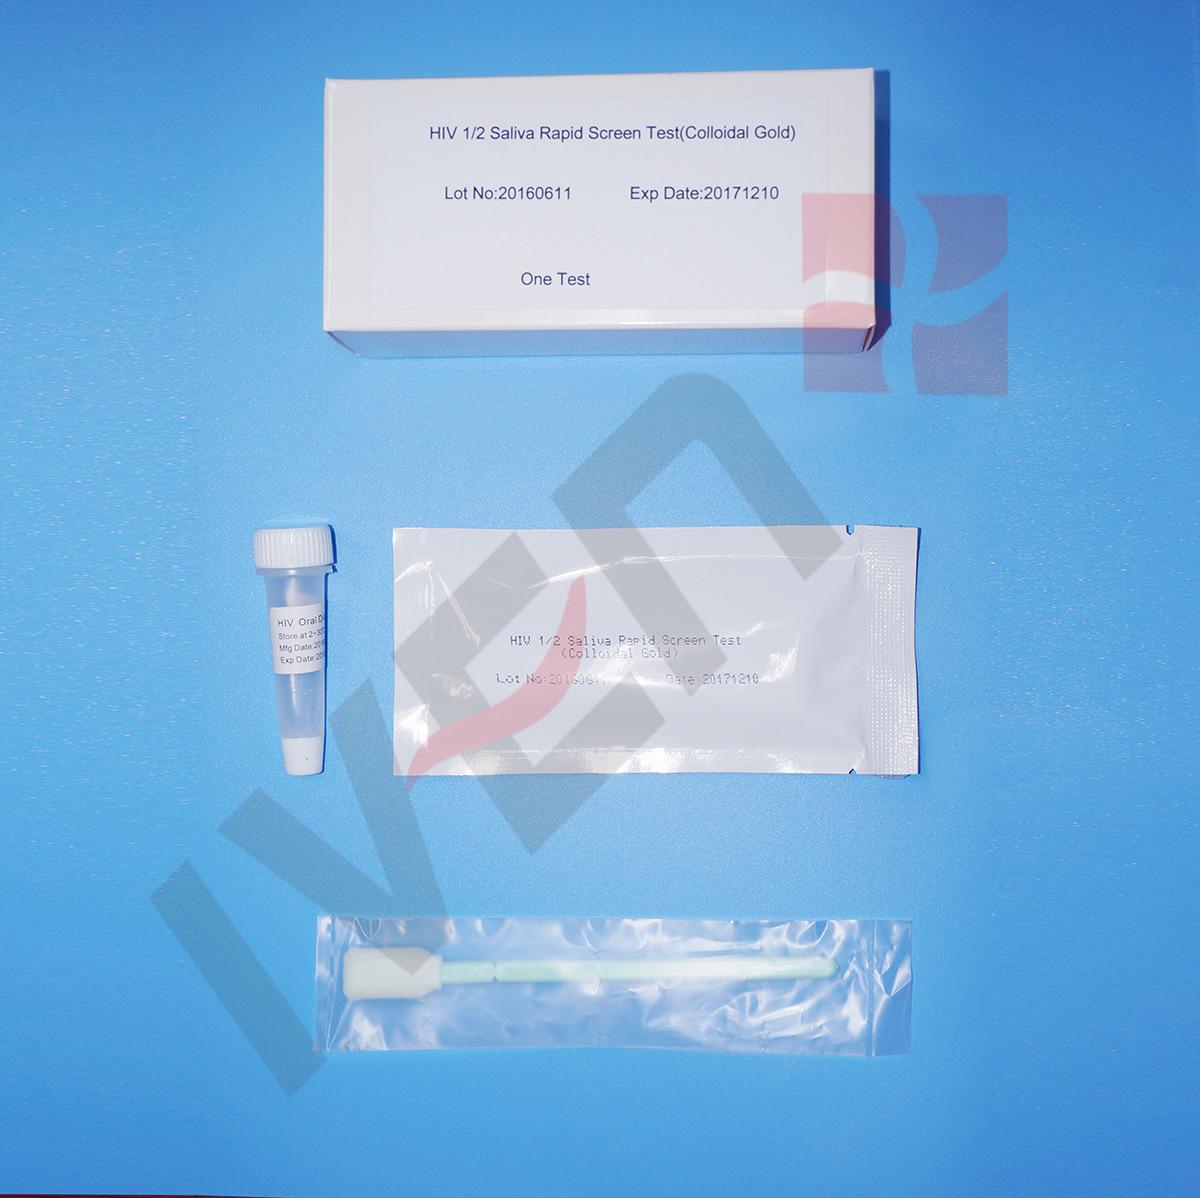 HIV Saliva One Step Test Kit